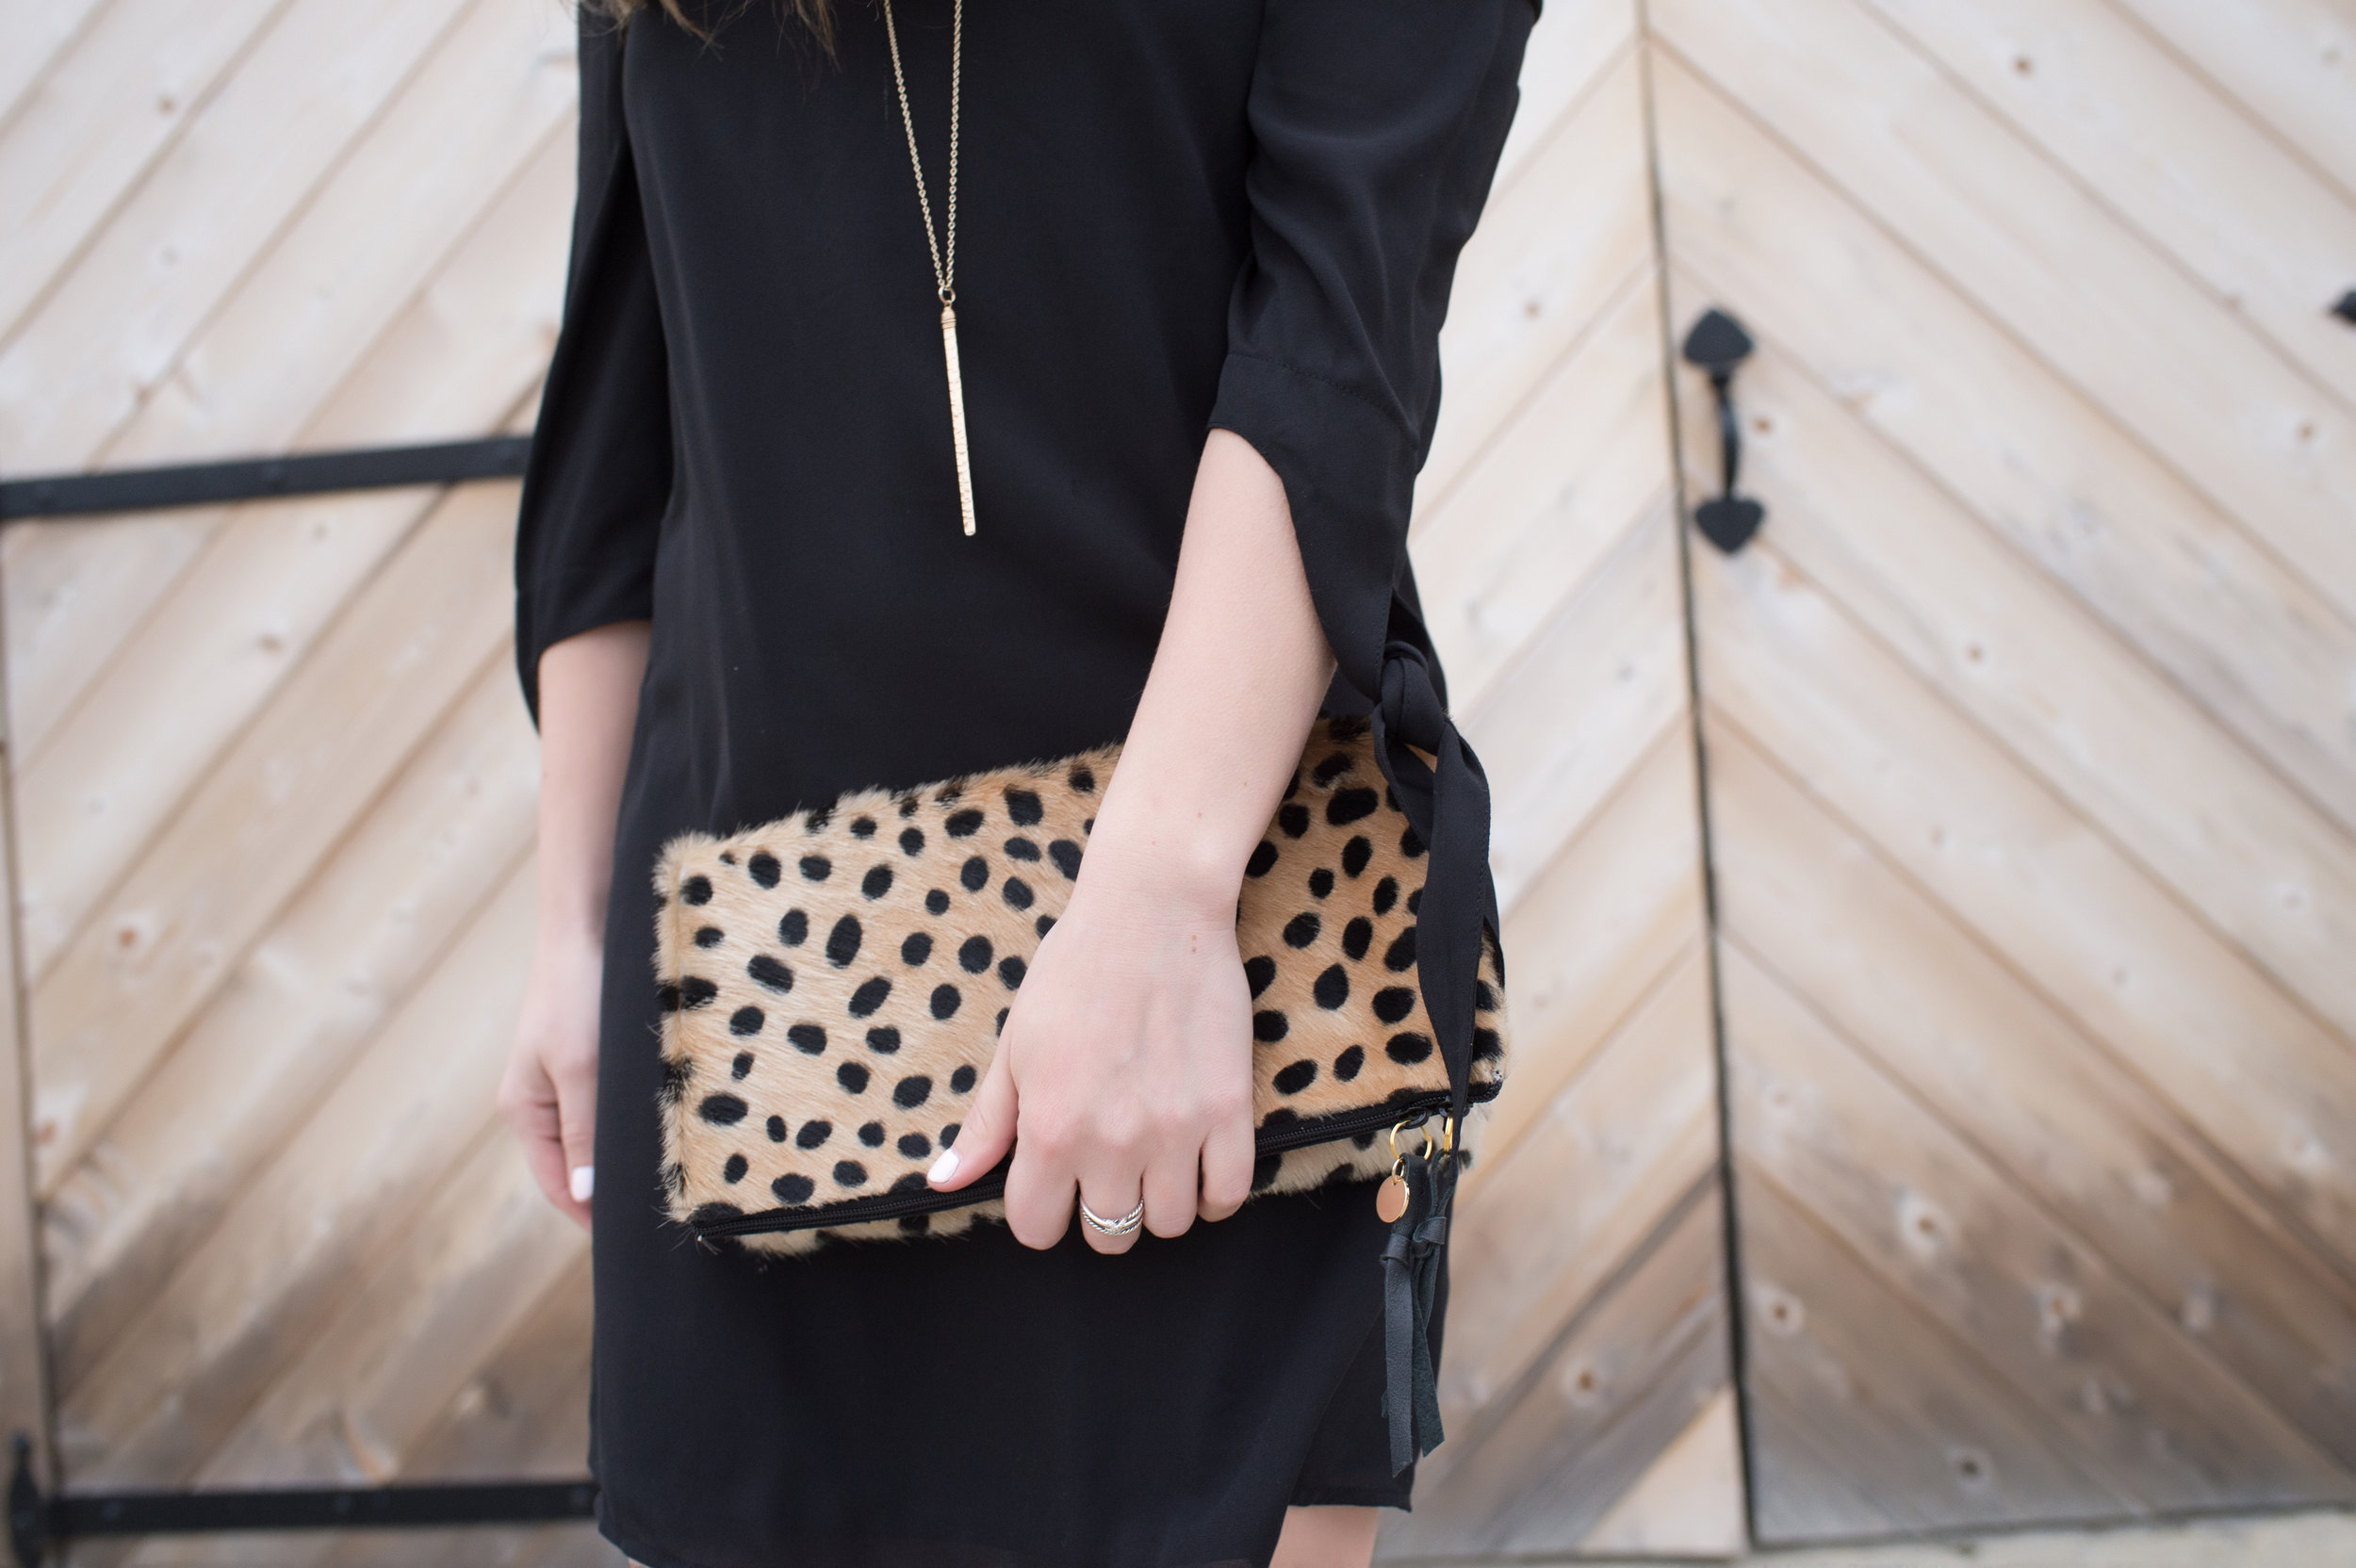 outfit details, gold necklace + cheetah clutch / pinebarrenbeauty.com